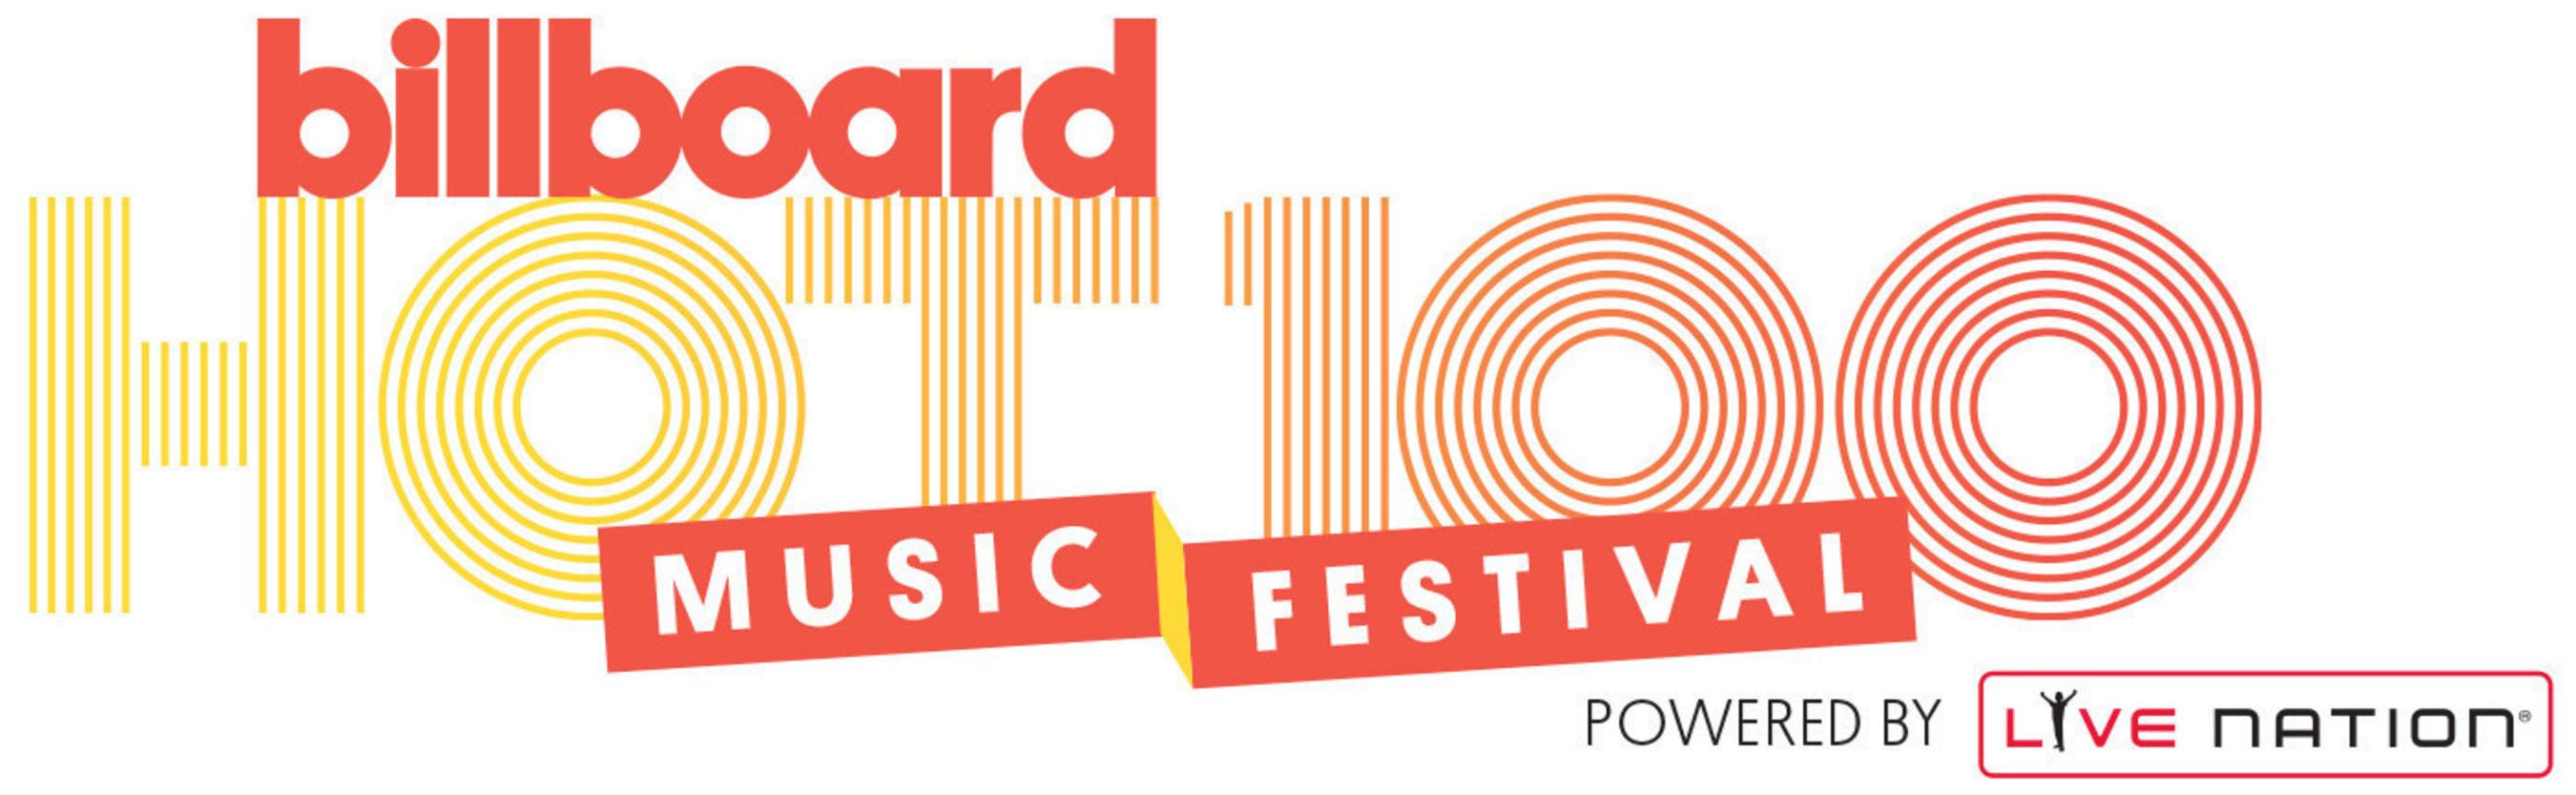 The Weeknd, Skrillex, Nicki Minaj, Lil Wayne encabezarán el primer Festival de Música Billboard Hot